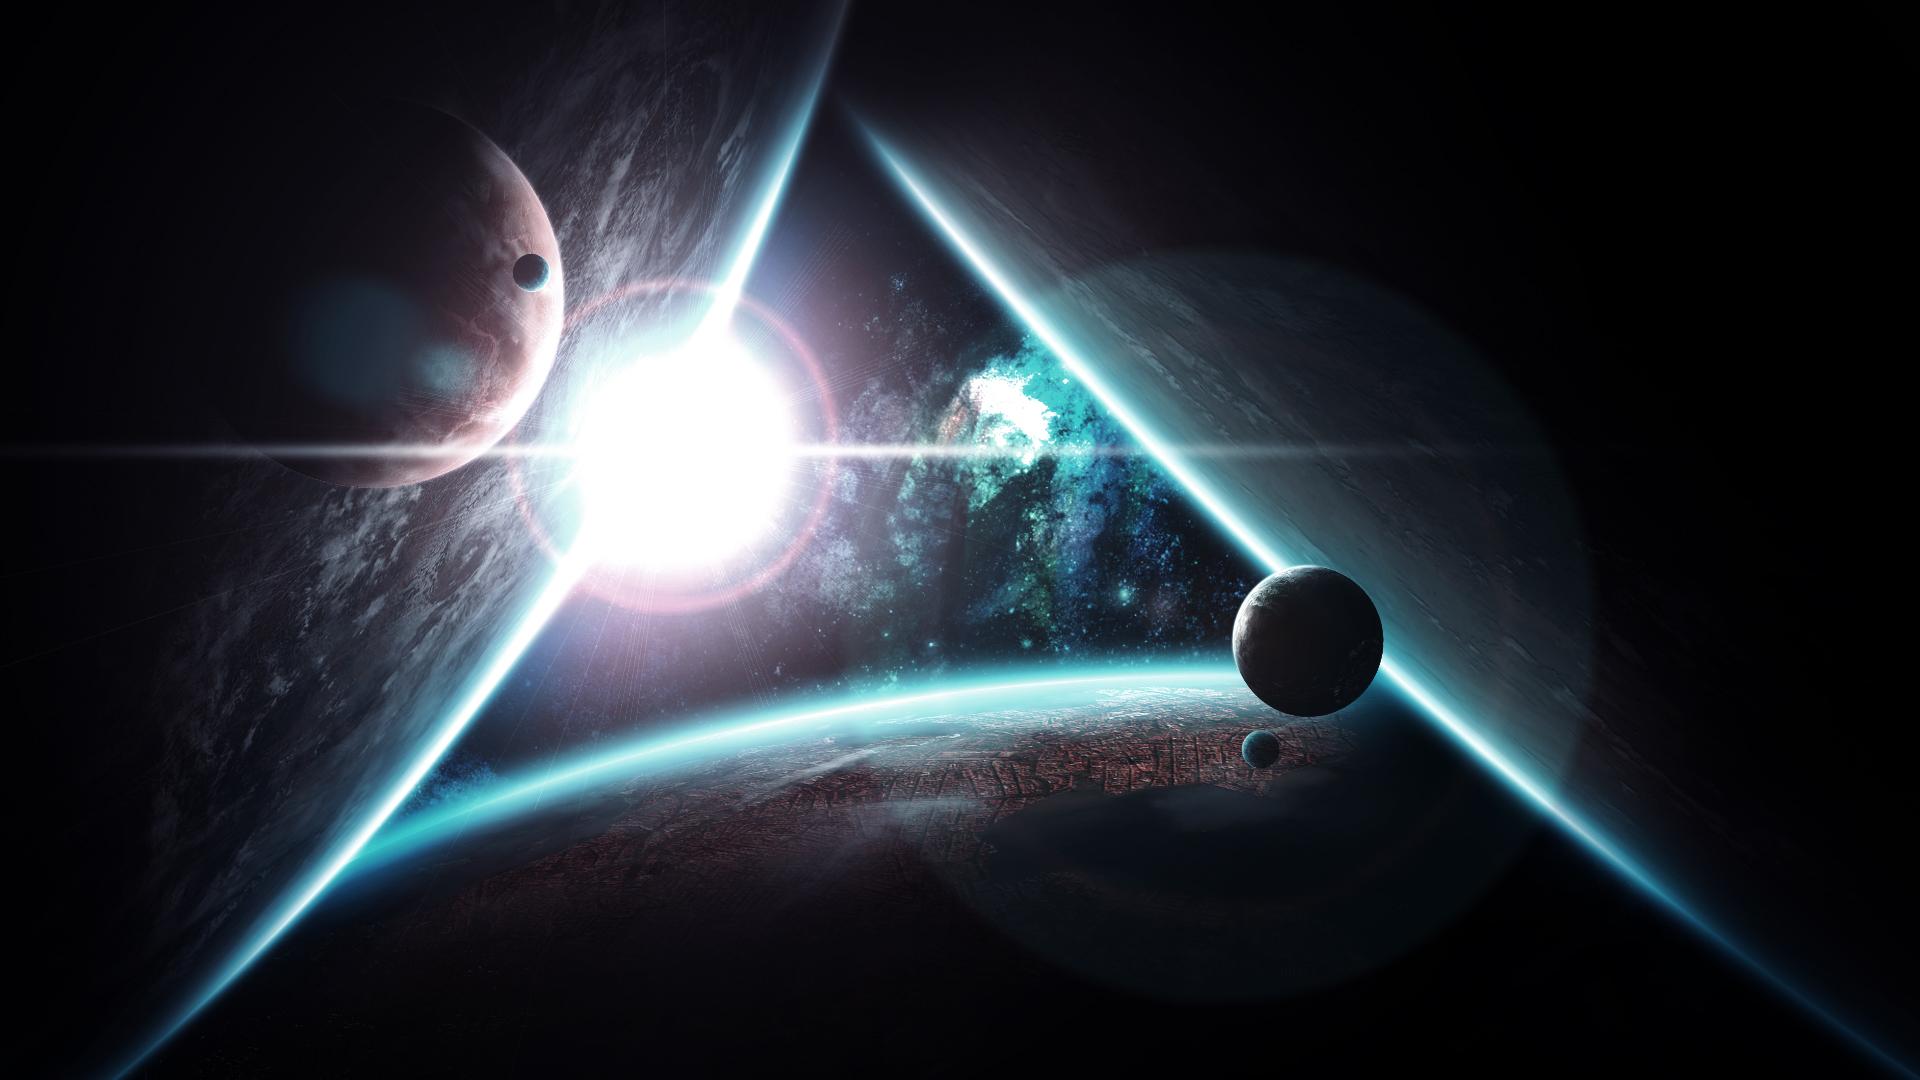 Planet Sci Fi 1920x1080